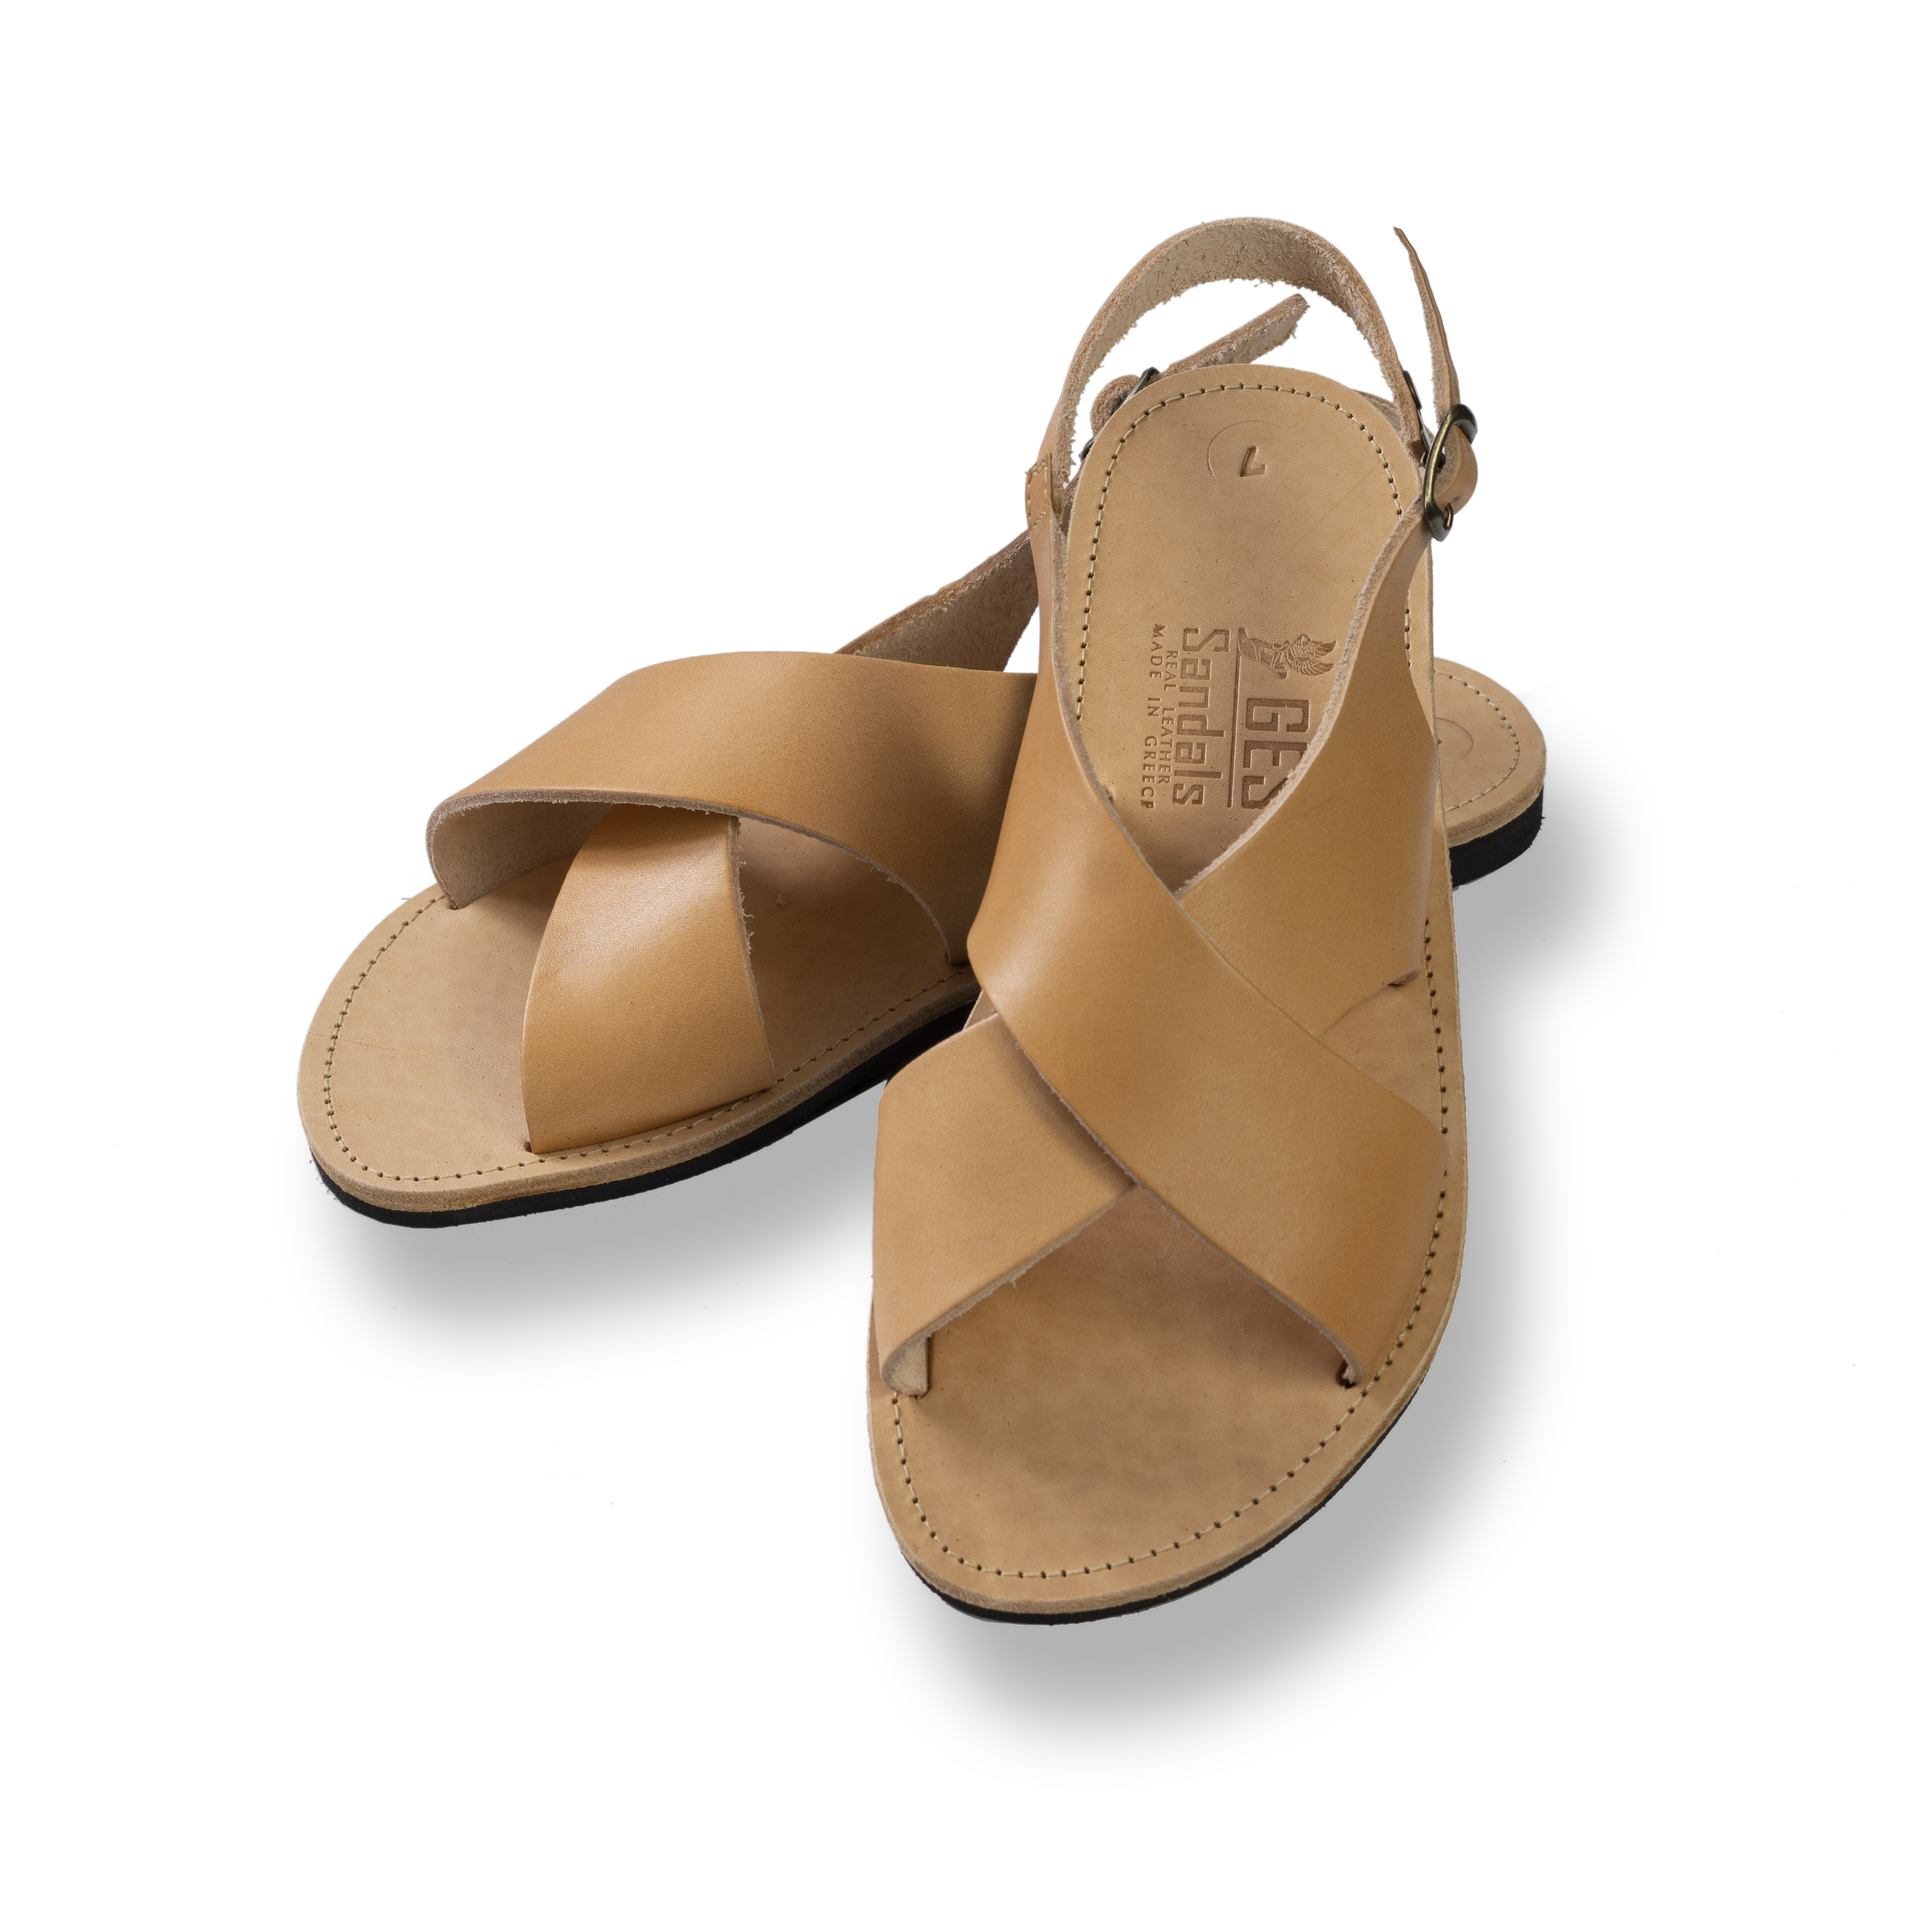 4d69fdee2f2c6 Classic Leather Woman Sandal - 413F